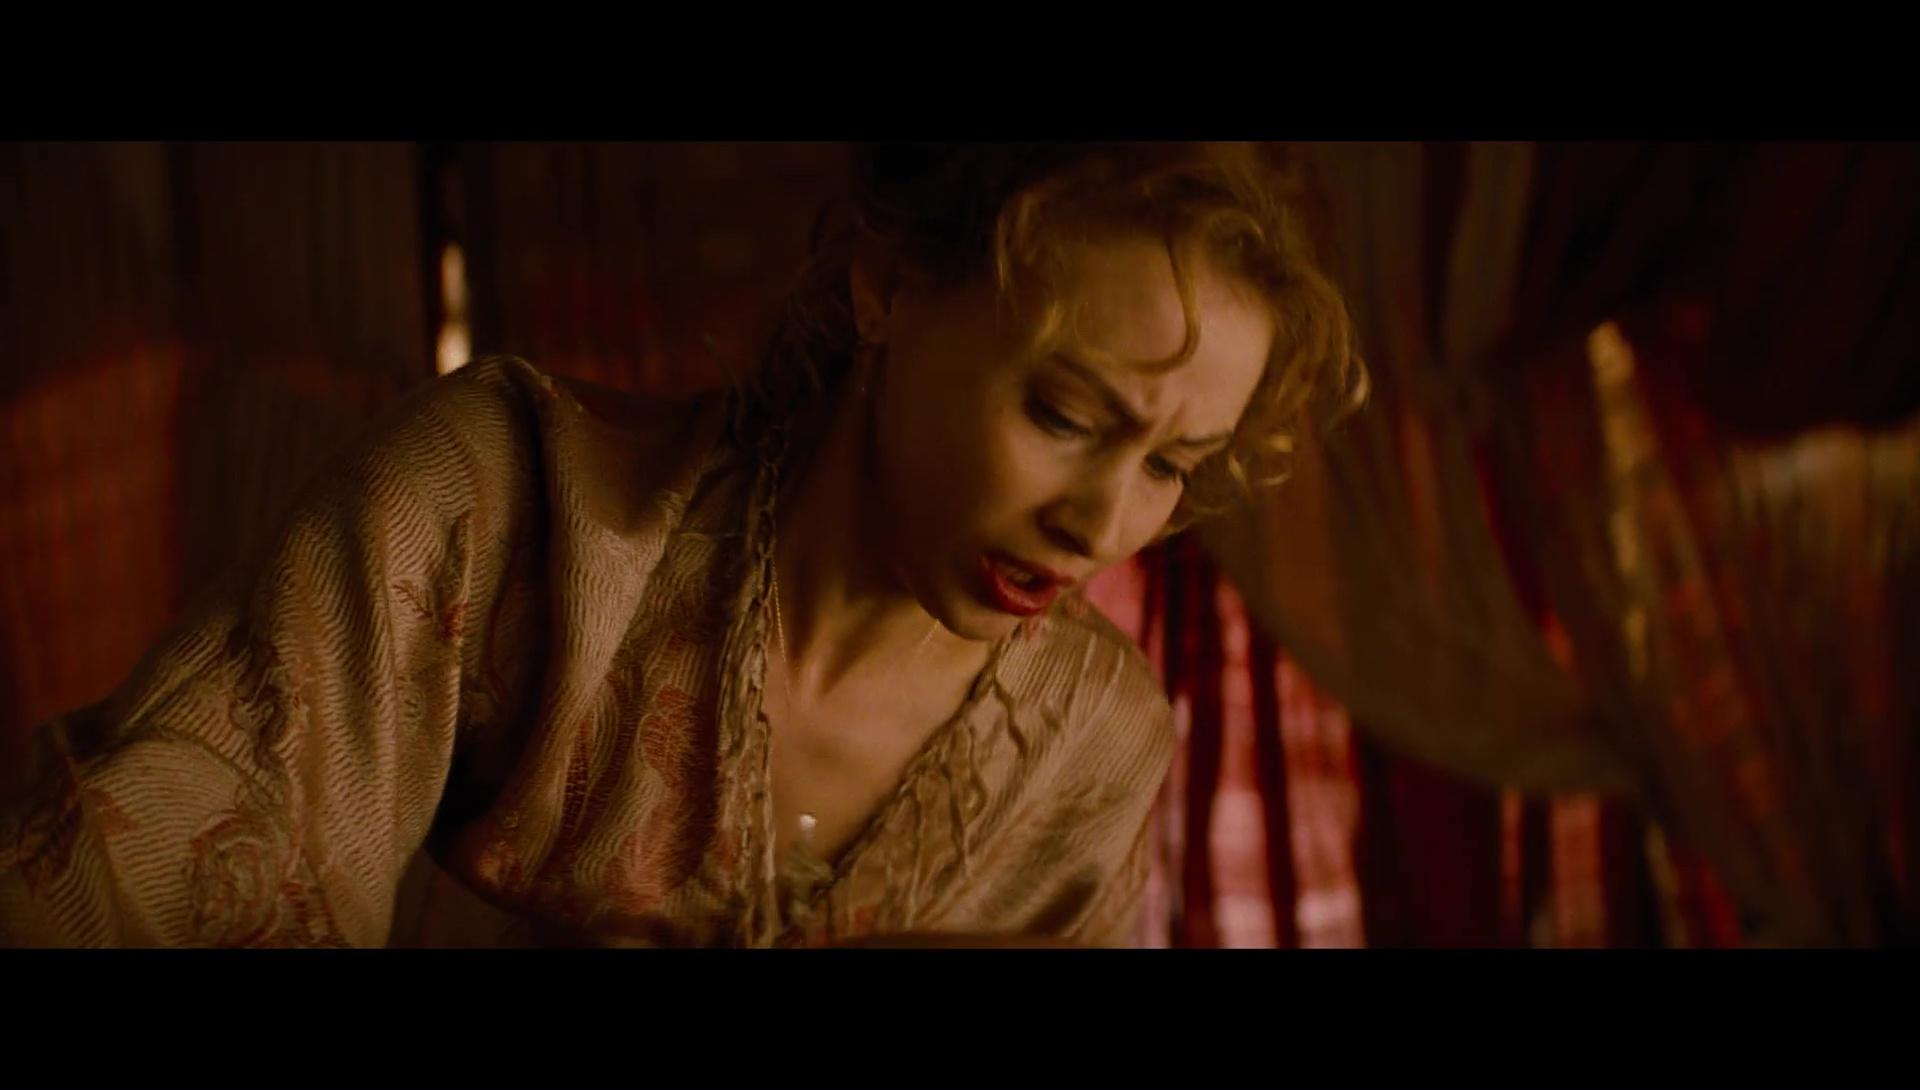 Dracula La Historia Jamas Contada 1080p Lat-Cast-Ing 5.1 (2014)